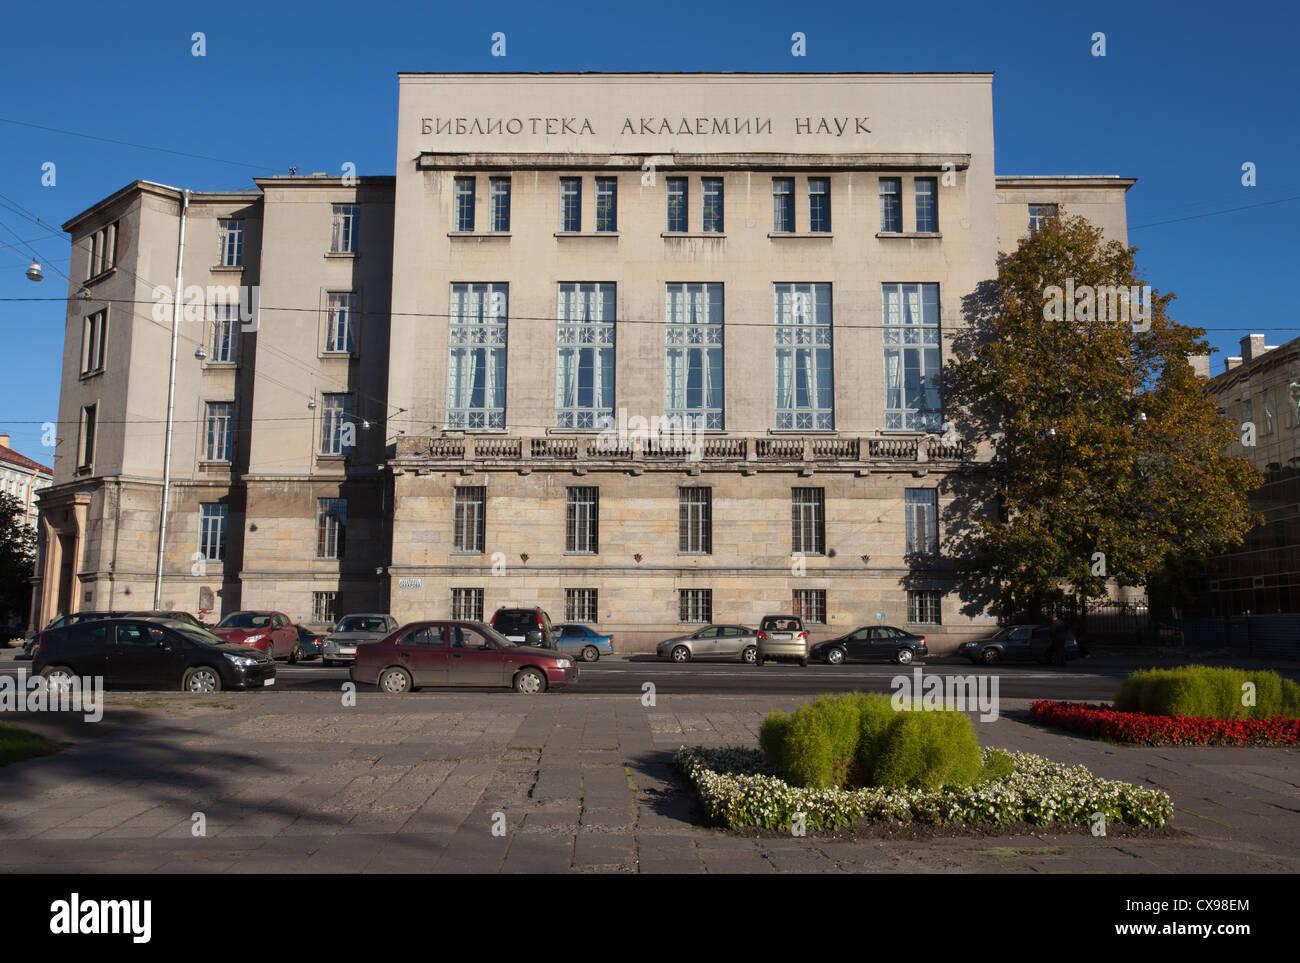 Library Saint Petersburg Stock Photos & Library Saint